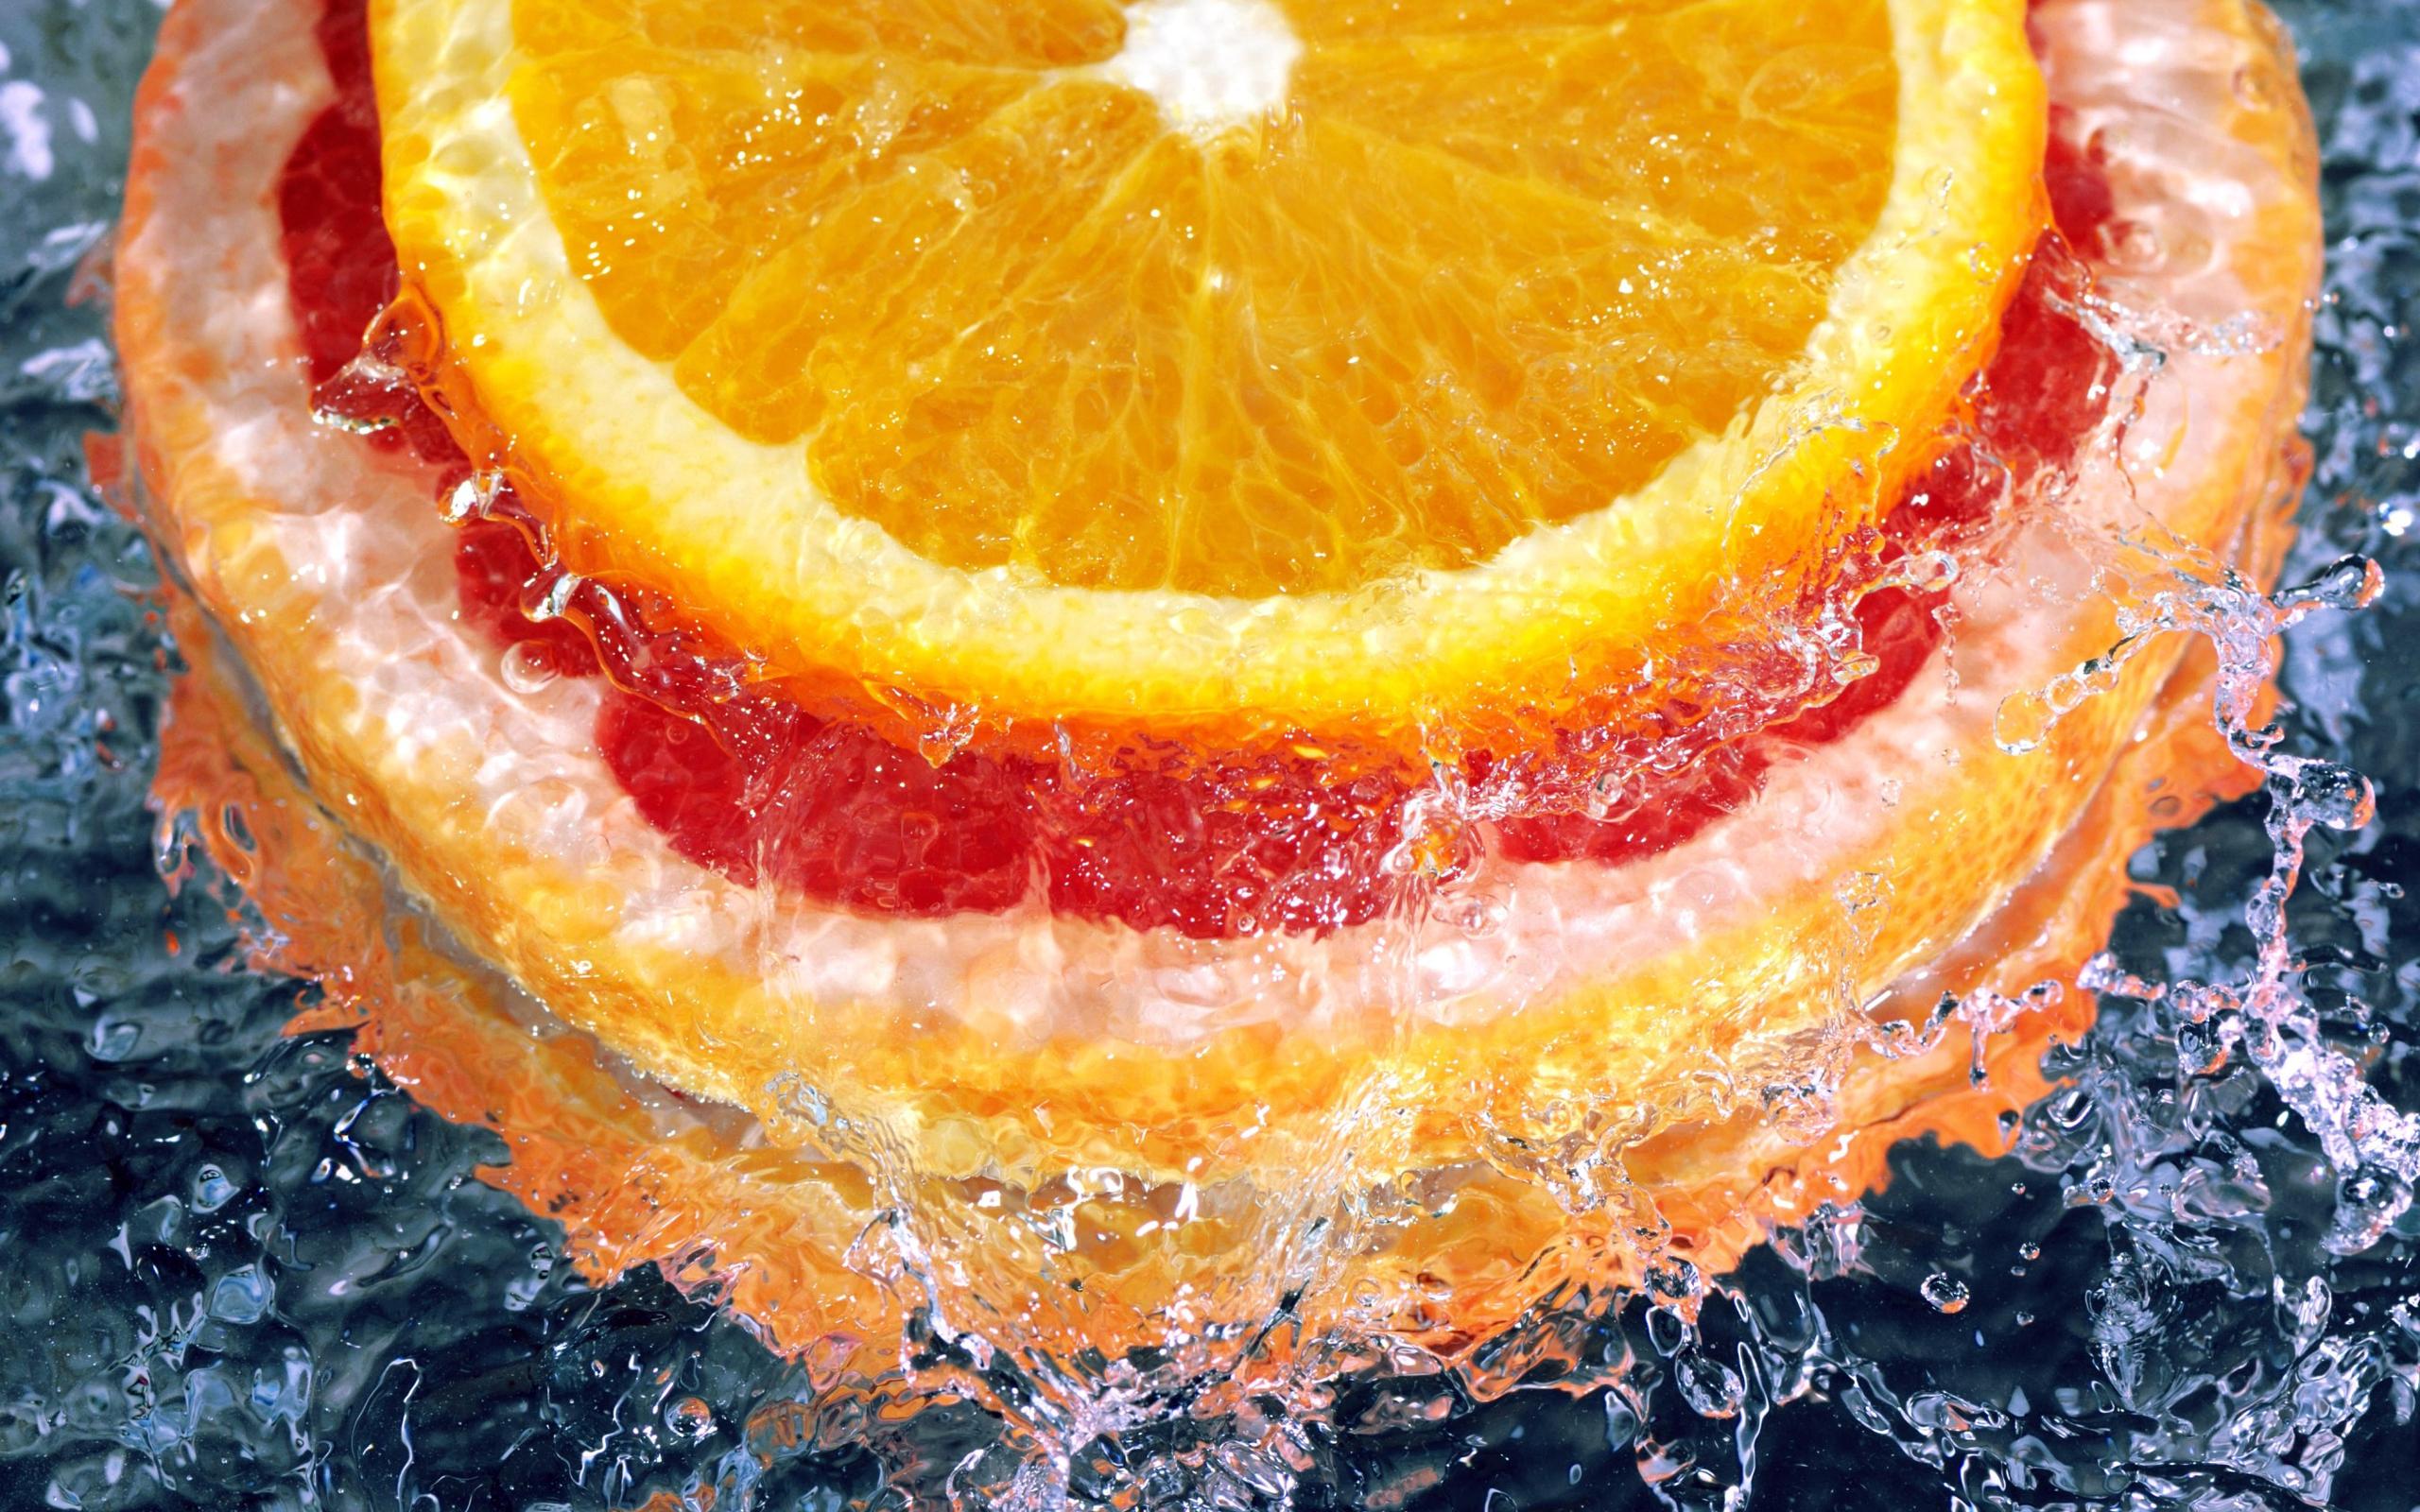 Orange fruit wallpaper hd